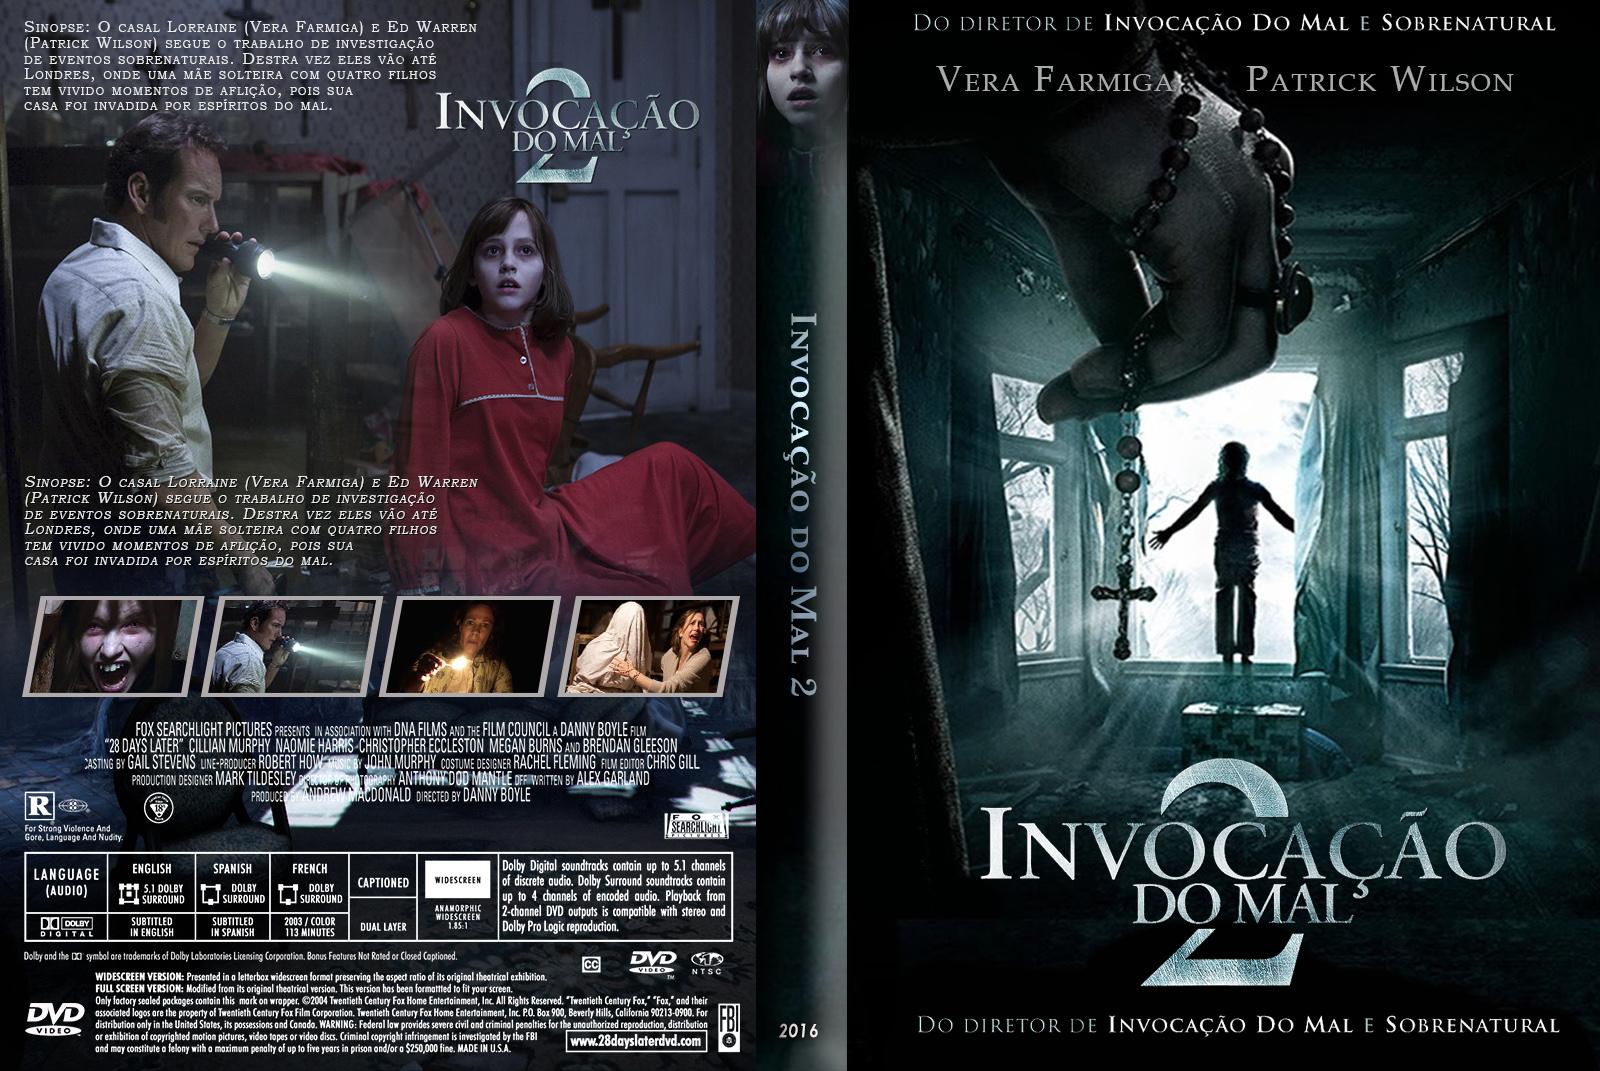 Invocação do Mal 2 DVD-R Invocação do Mal 2 DVD-R eoJFpwll